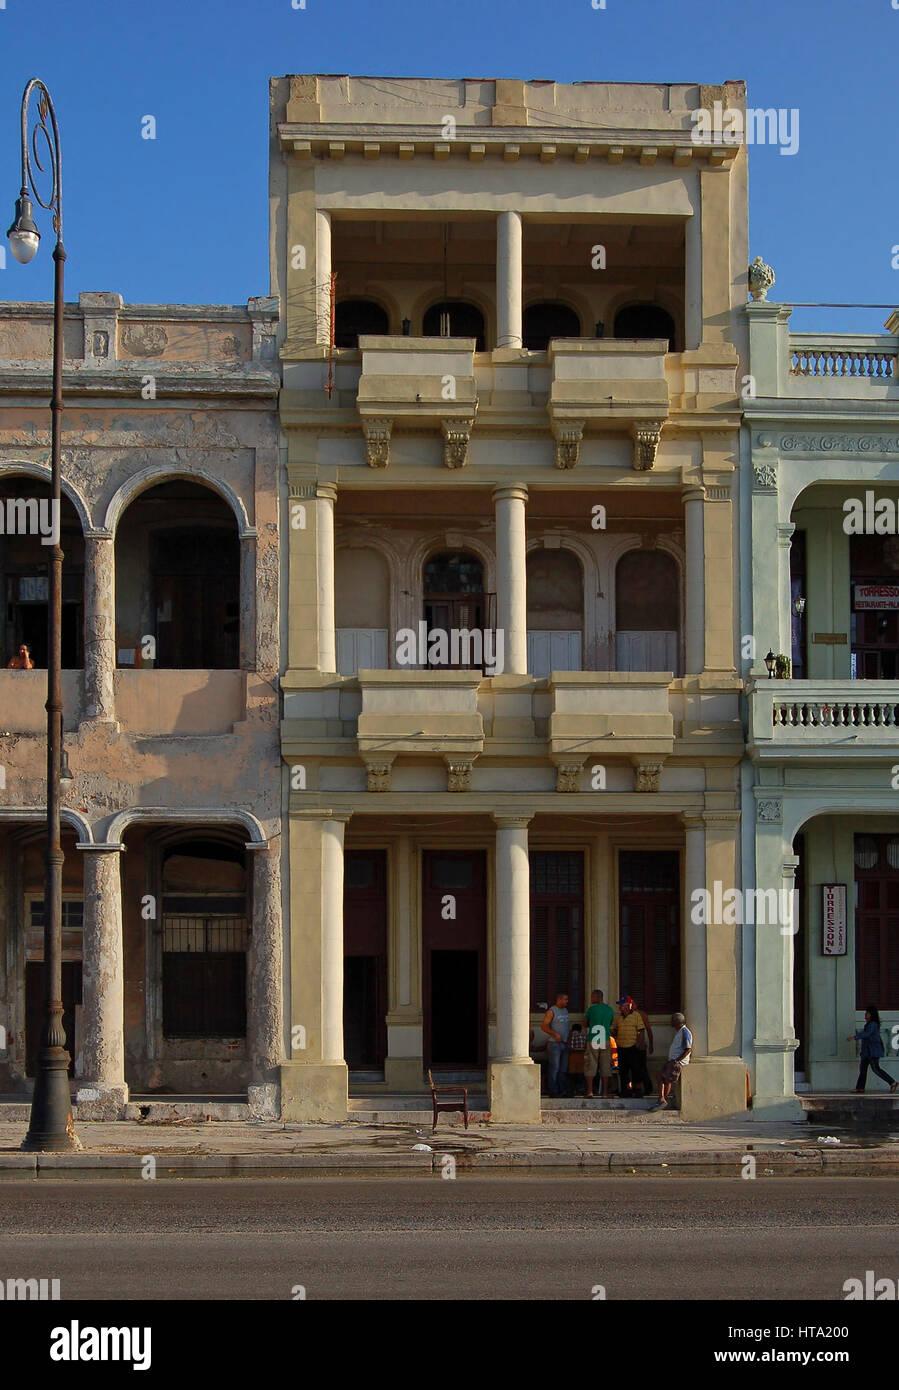 Seafront Residence along El Malecon, Havana, Cuba - Stock Image